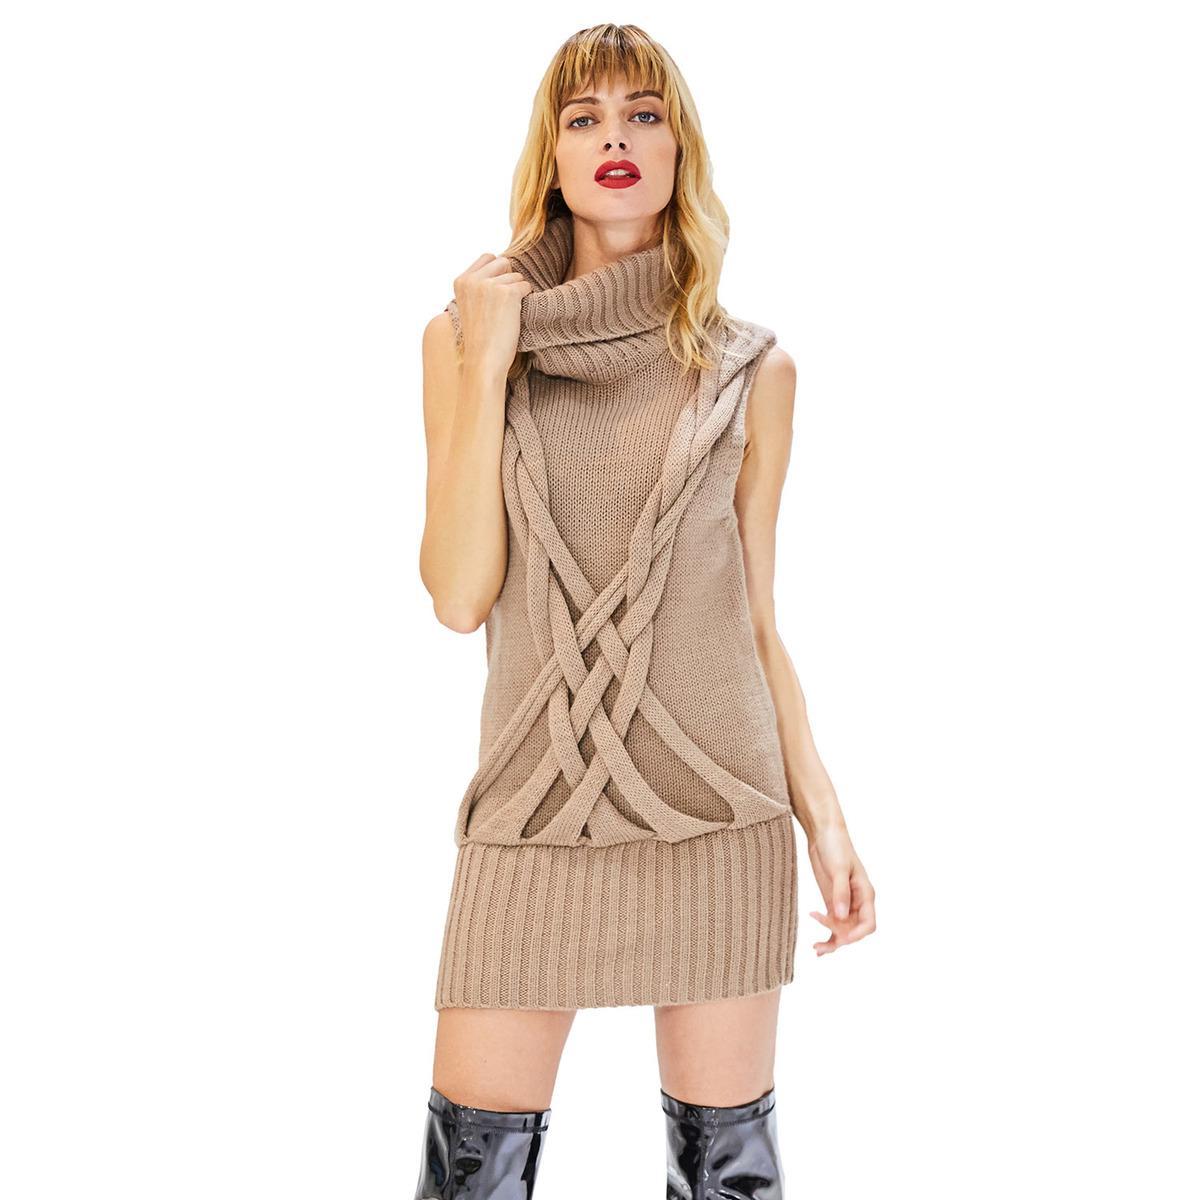 9a9a63bcdf96 2018 Winter Dresses Women Knitted Sleeveless Turtleneck Dress Khaki Warm  Knitwear Casual Office High Neck Sweater Dress Black Dresses Long Dresses  From ...